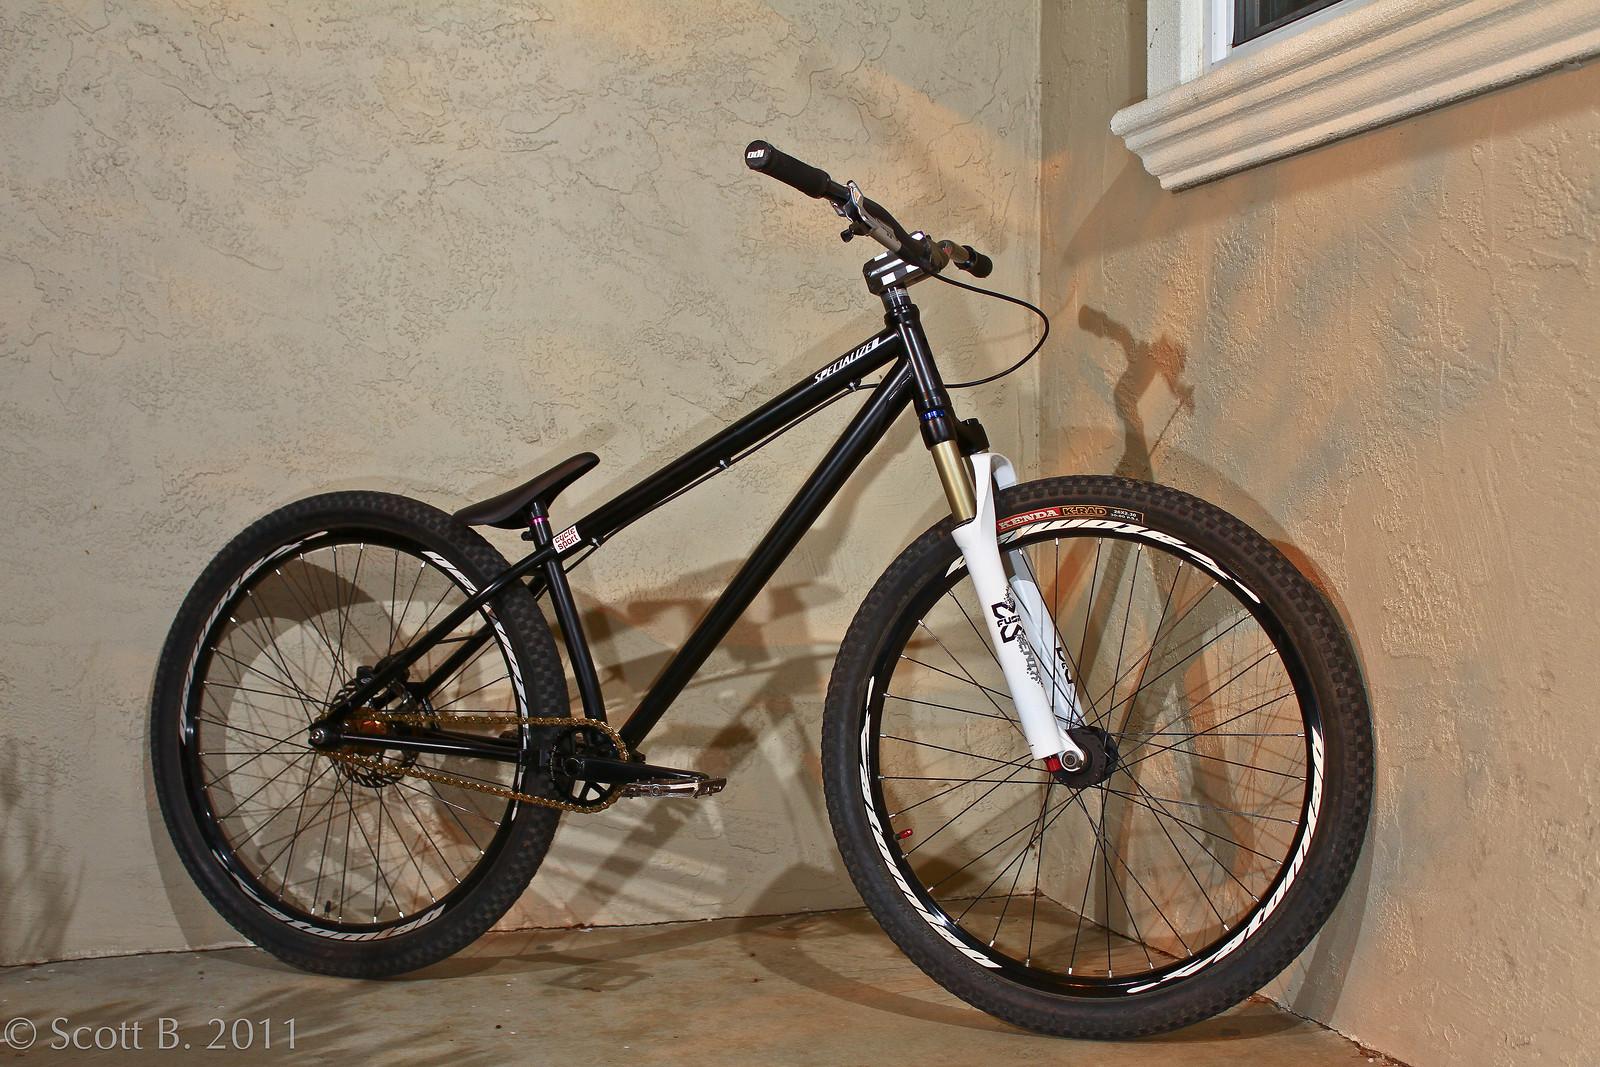 It rides nice...